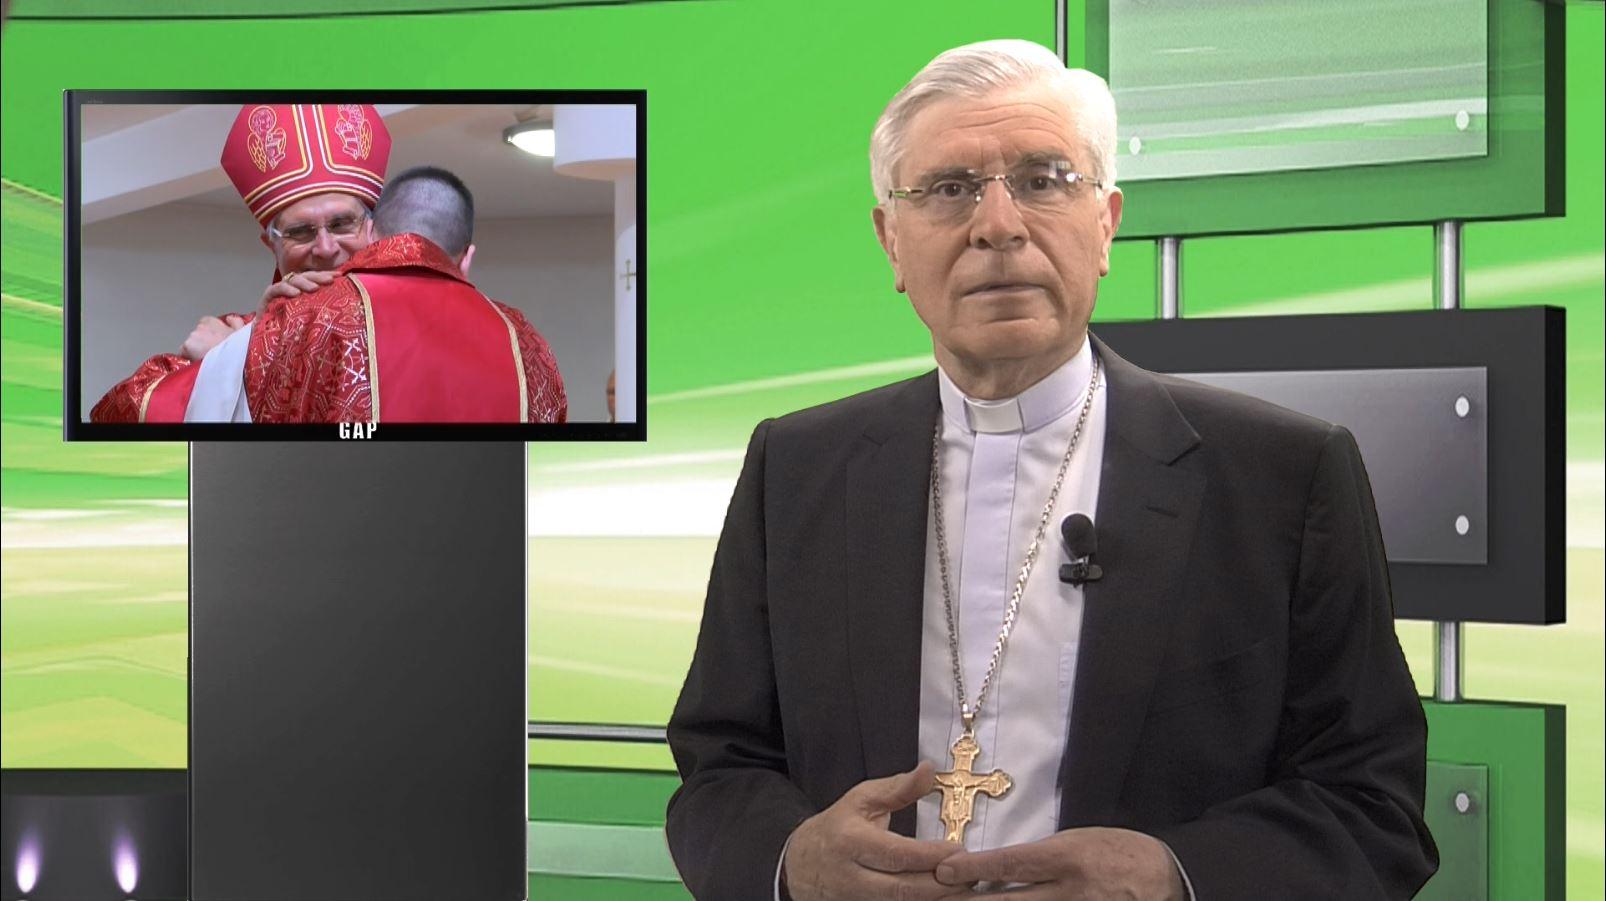 La chronique de Mgr Jean-Michel di Falco Léandri –  Il n'y a pas qu'Afflelou qui est fou !